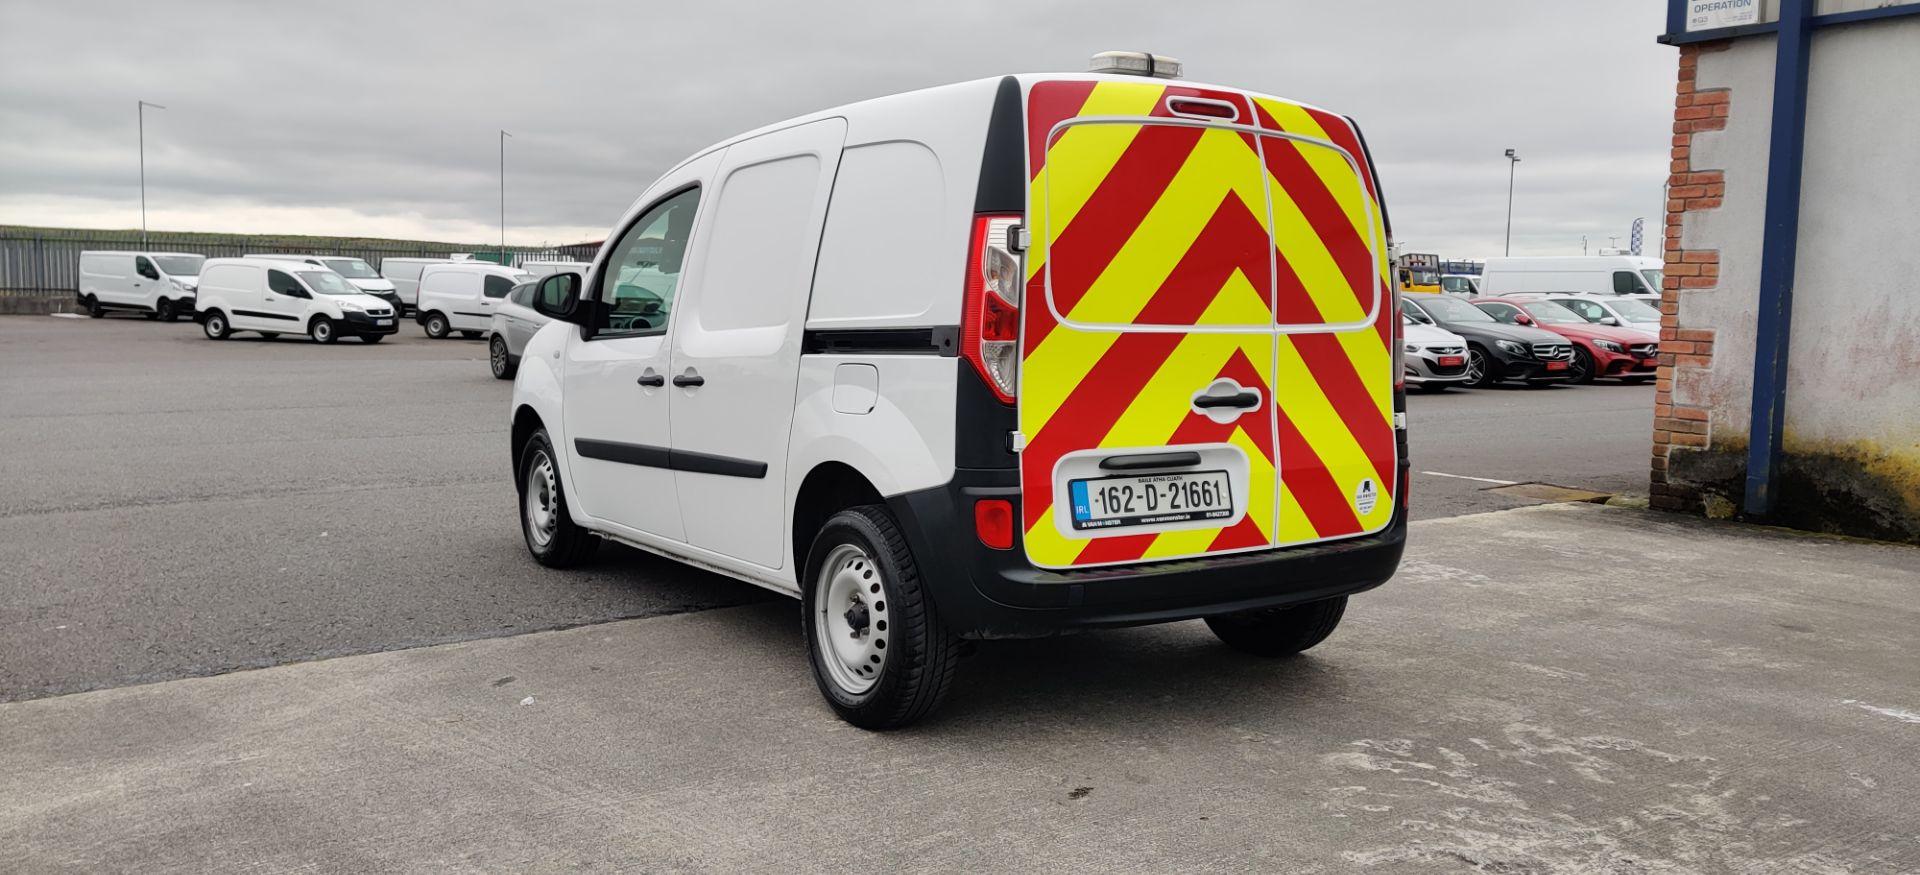 2016 Renault Kangoo ML19 Energy DCI 75 Business 2D (162D21661) Image 4